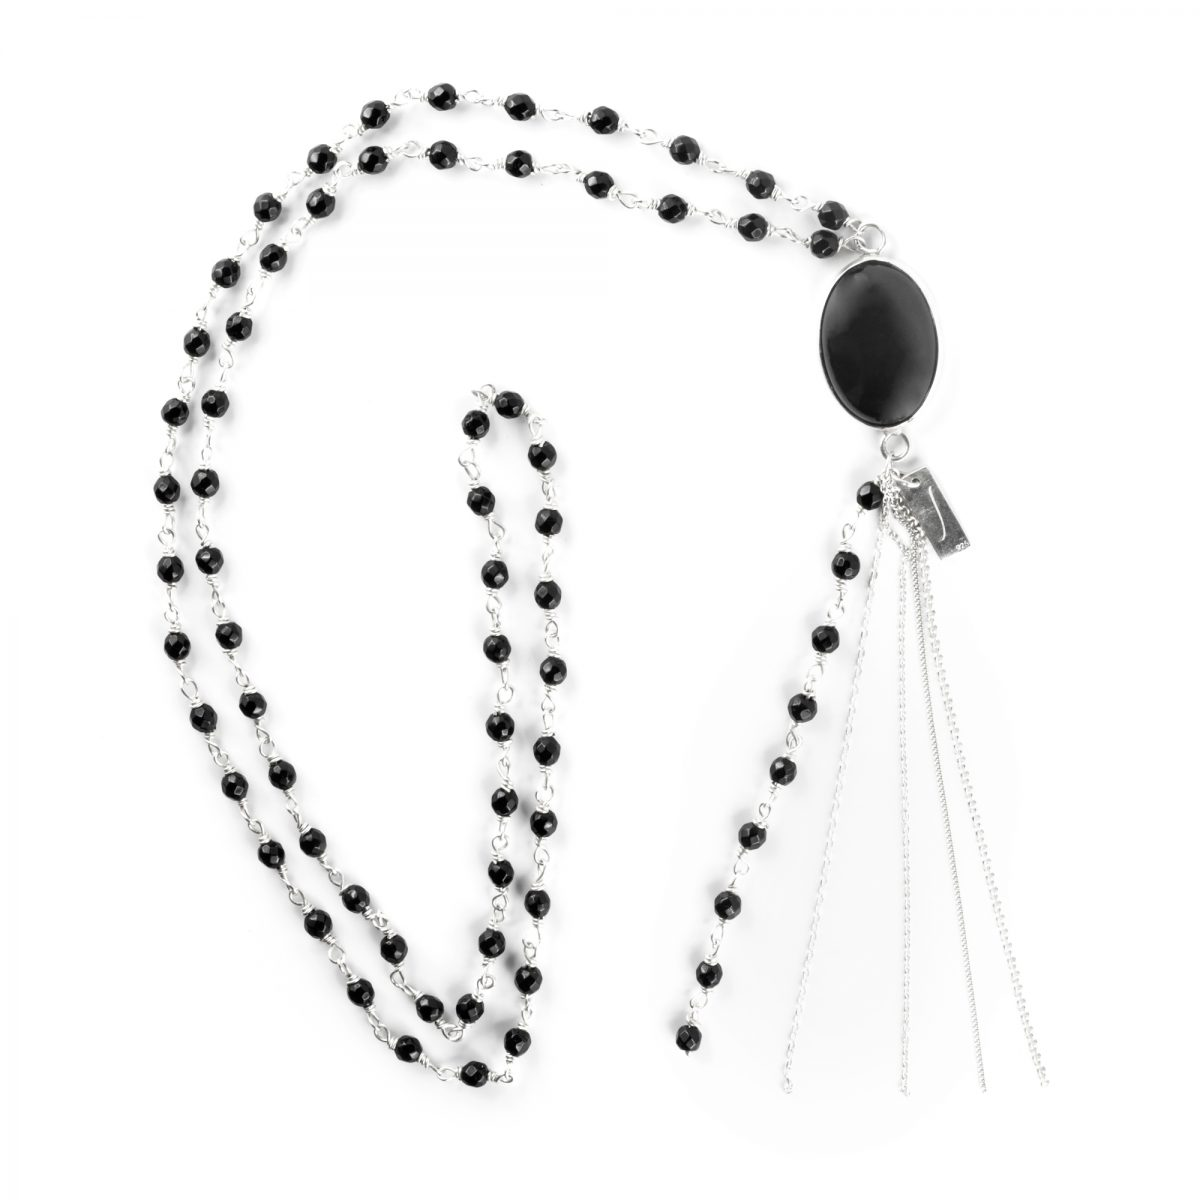 Collier perles onyx argent Perle de Jade